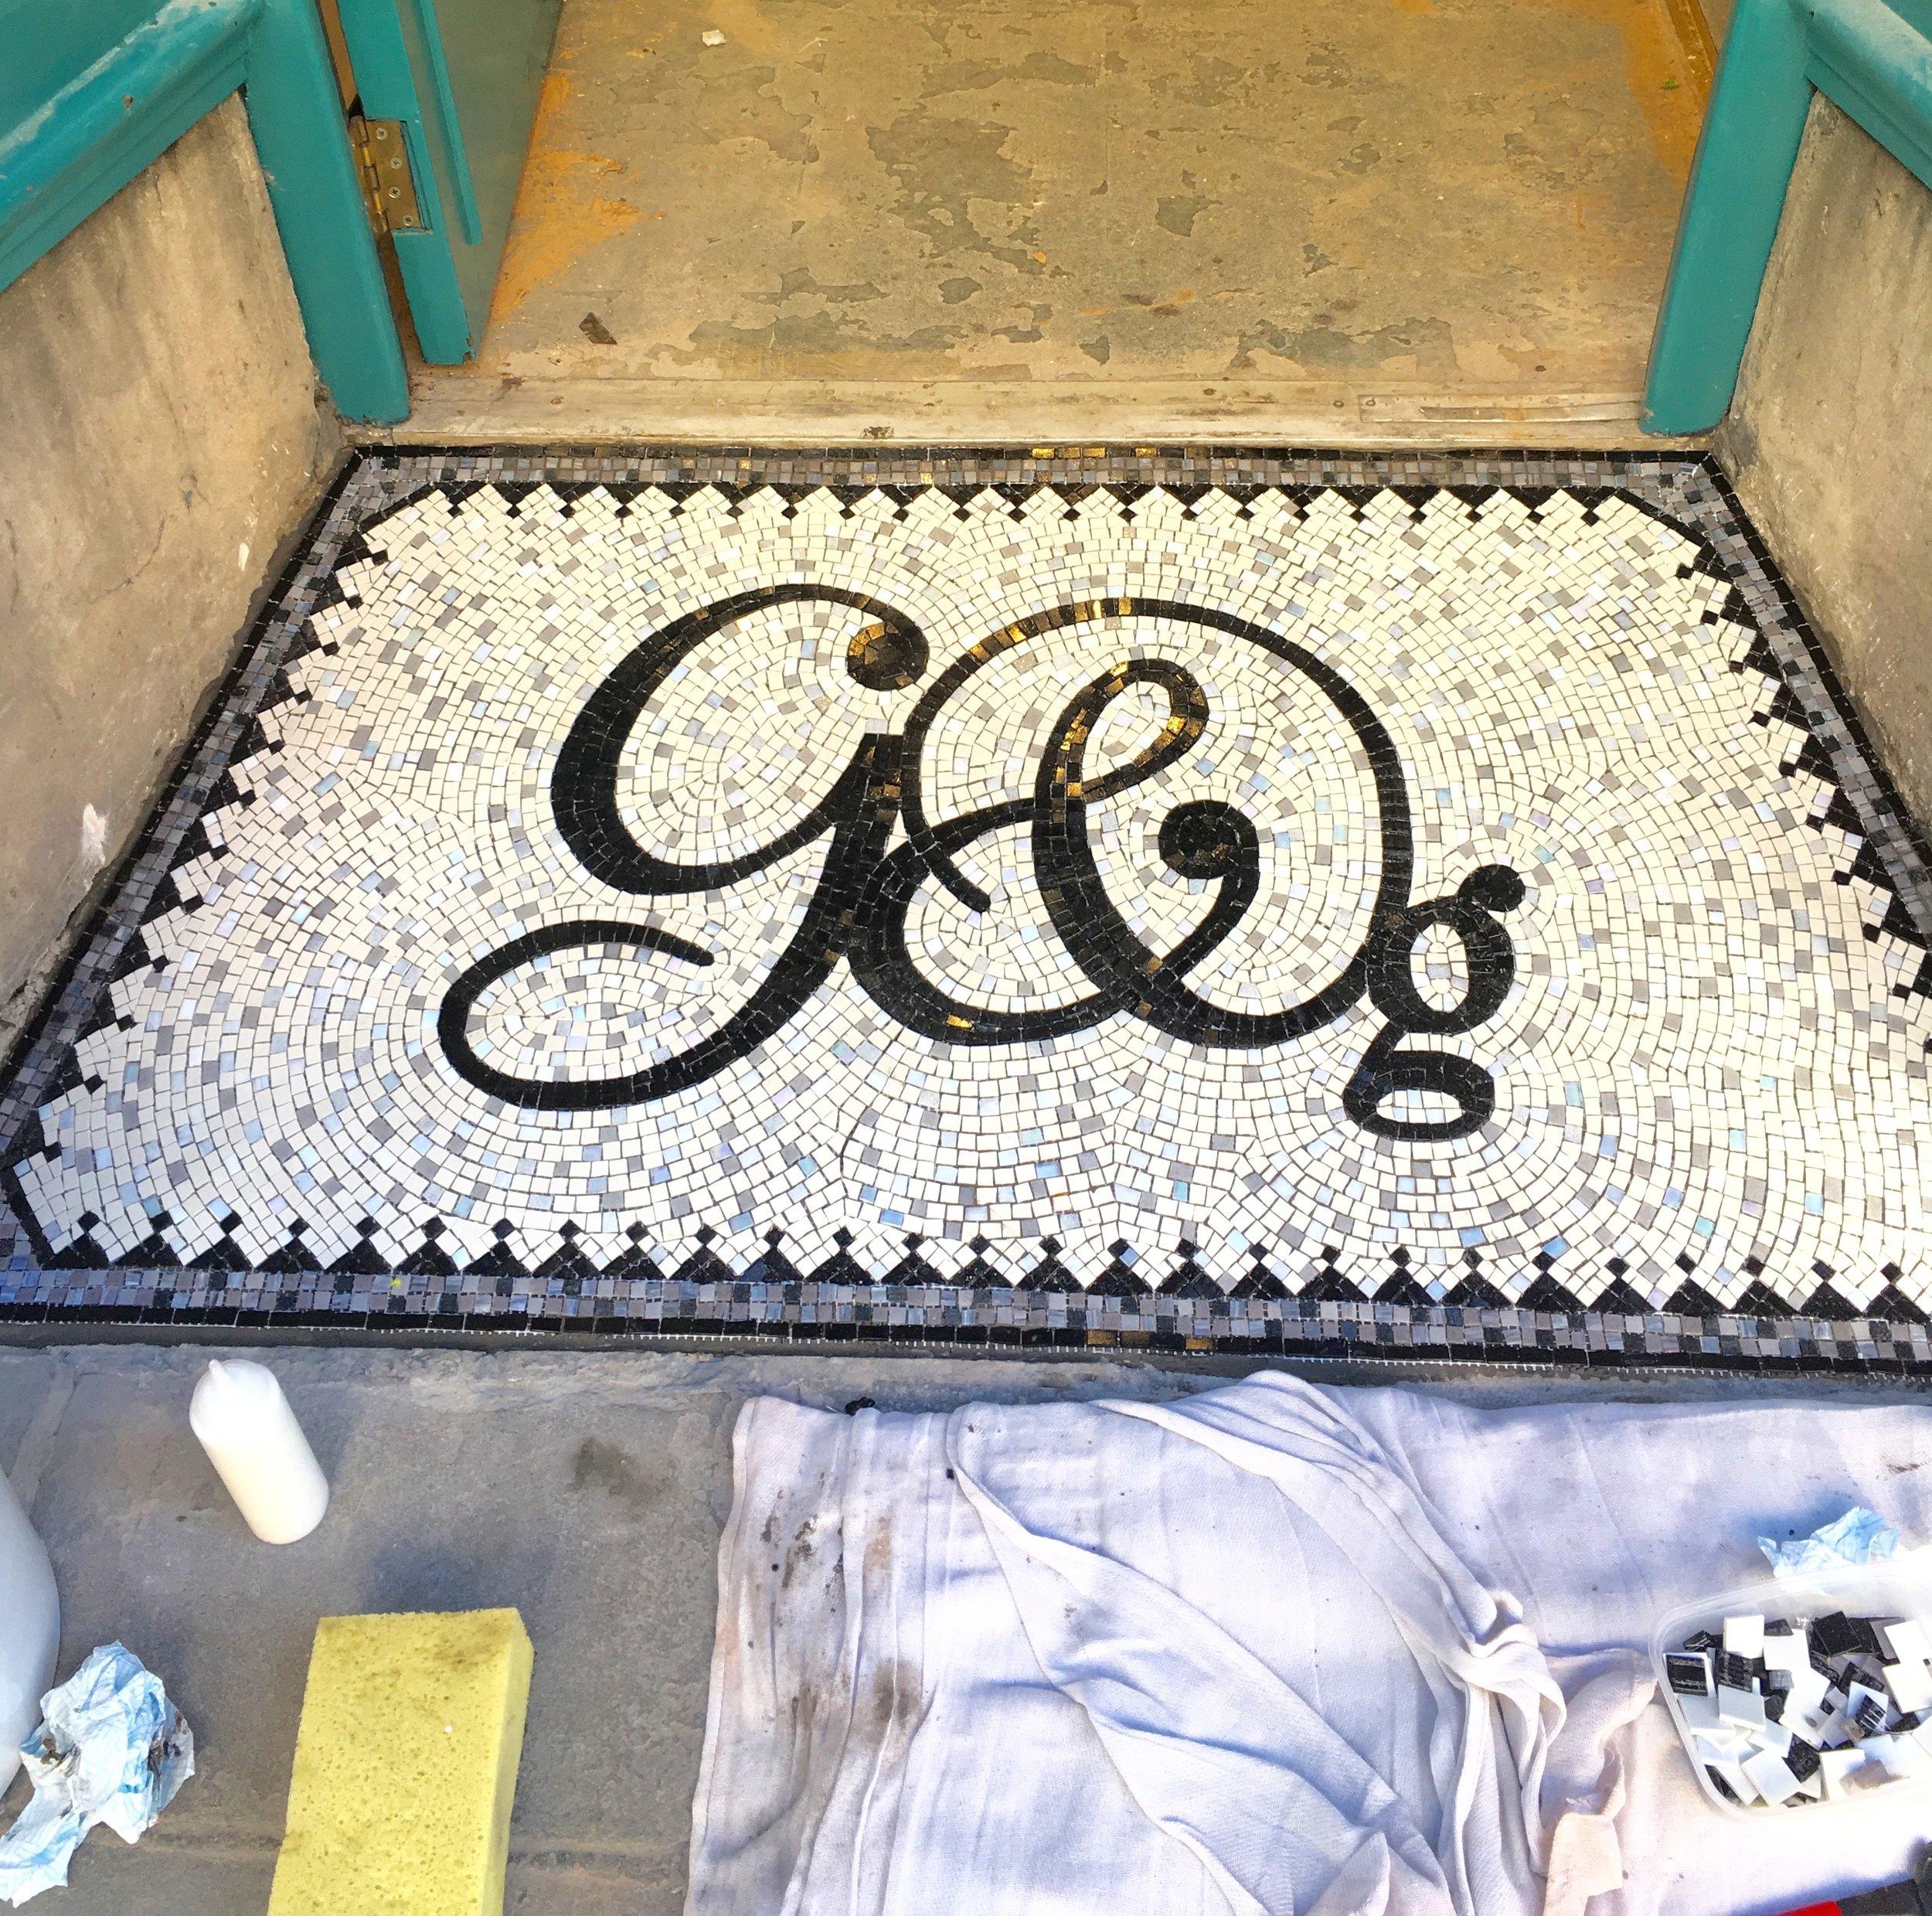 Making a mosaic on mesh. Graham and Green Bath shop doorway mosaic.